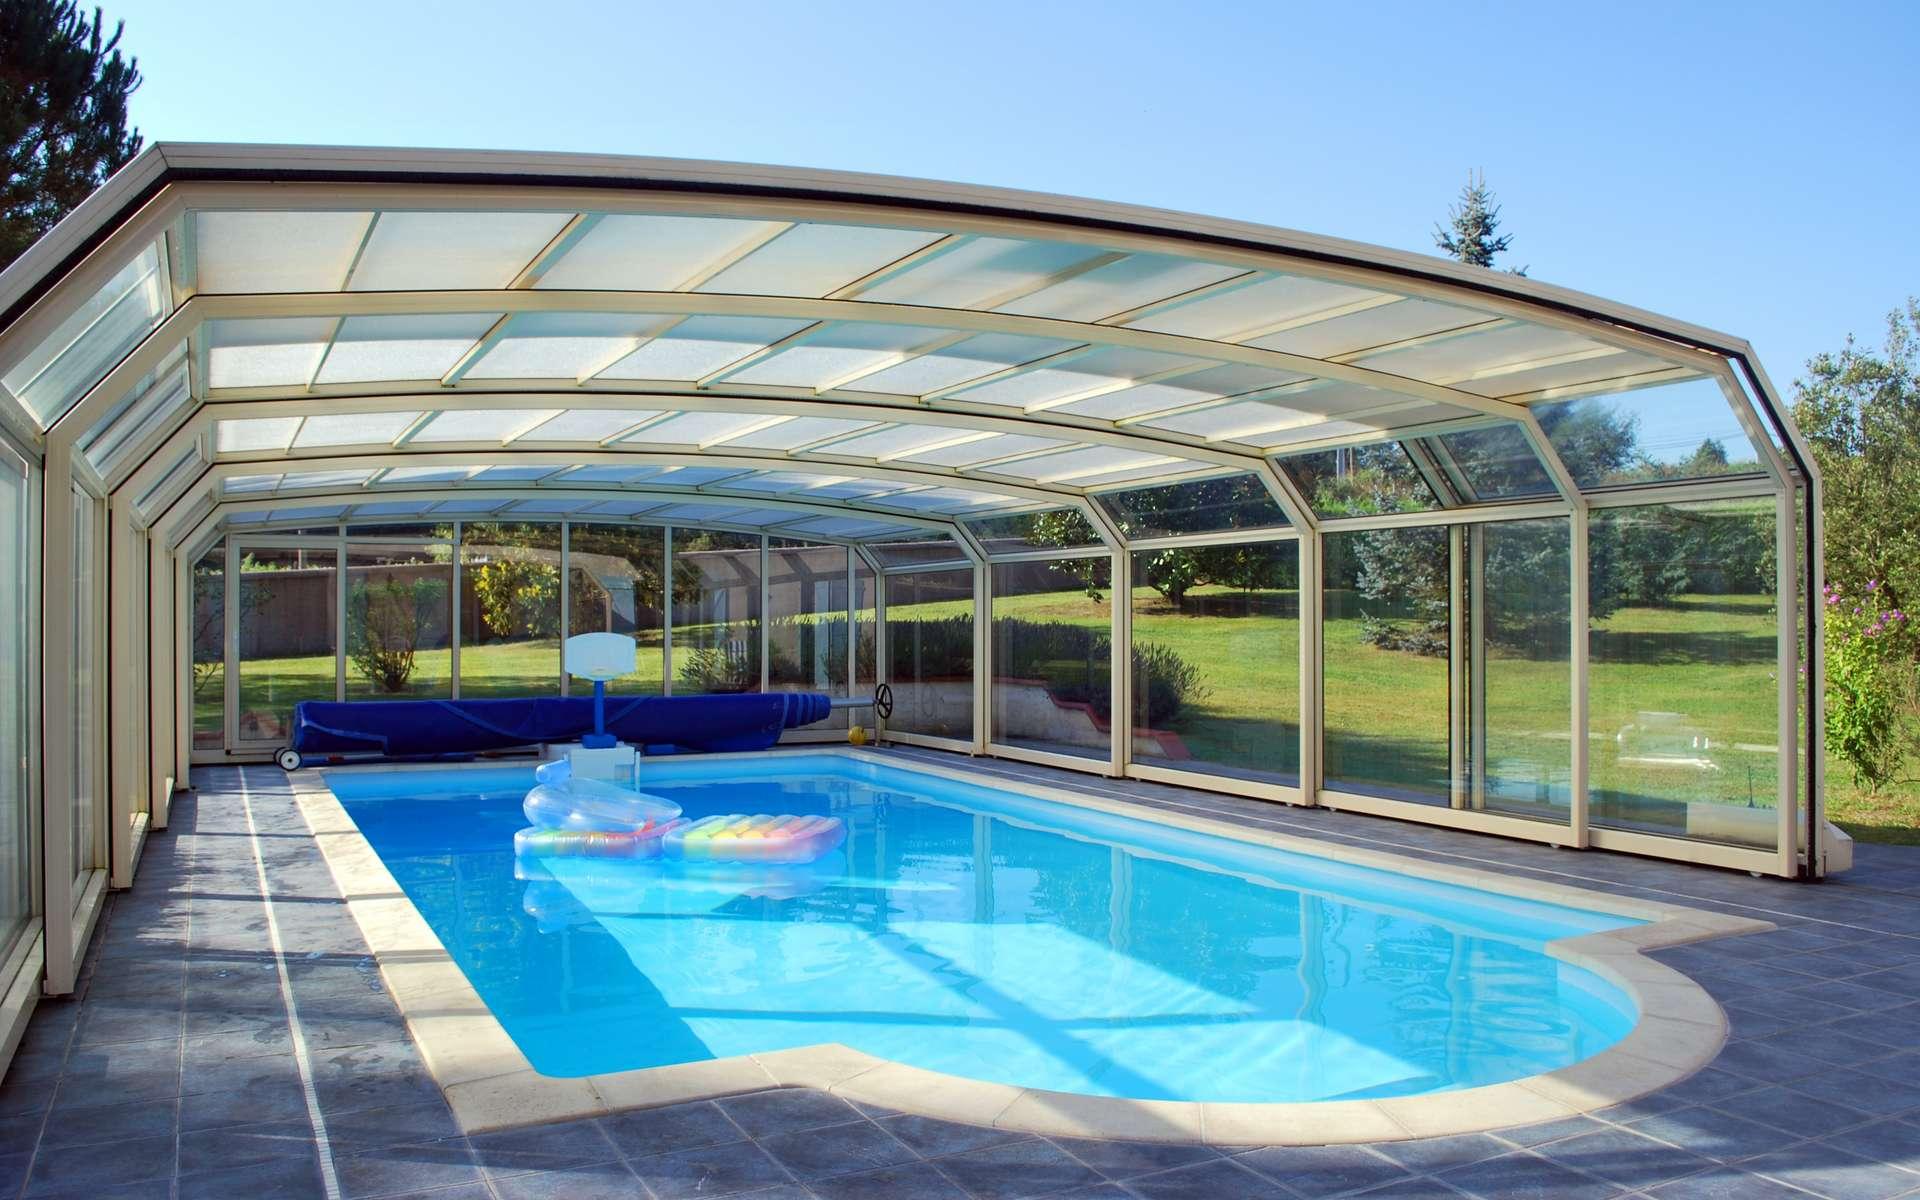 Comment choisir son abri de piscine ? ©Yvann K , Adobe Stock